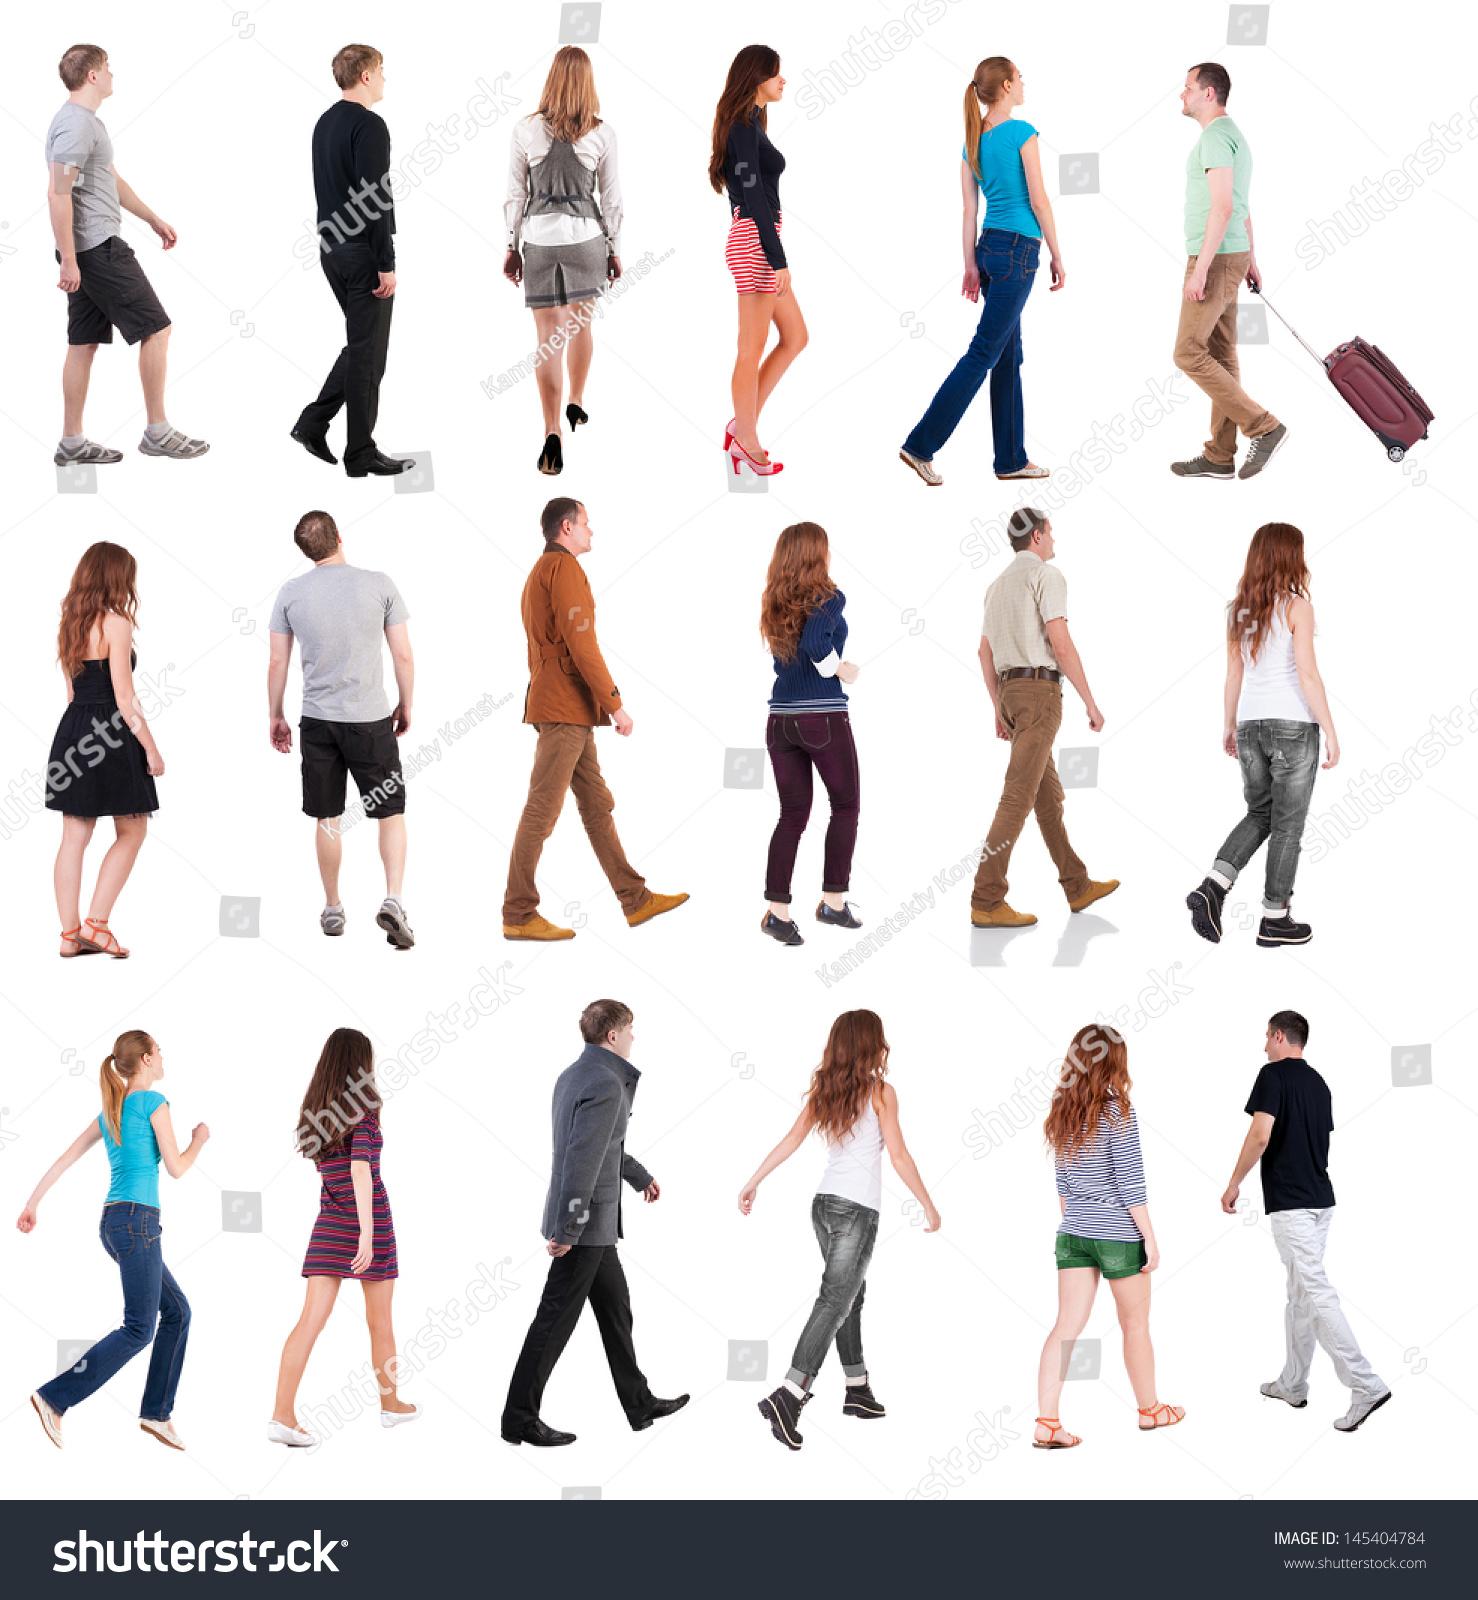 stock image of people - photo #36